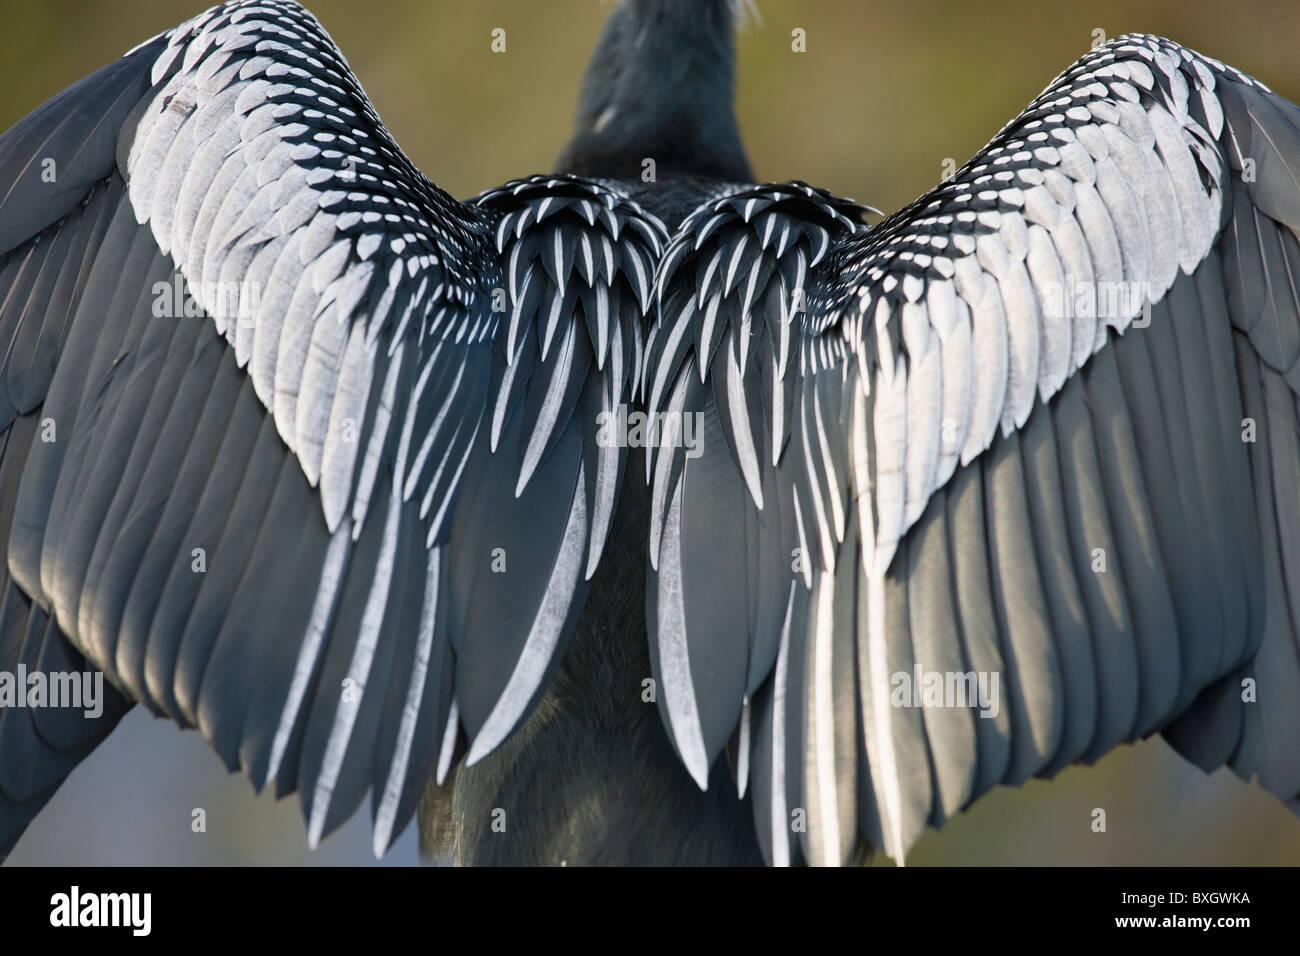 Anhinga snakebird darter, Anhinga anhinga, air drying feathers in the Everglades, Florida, United States of America - Stock Image